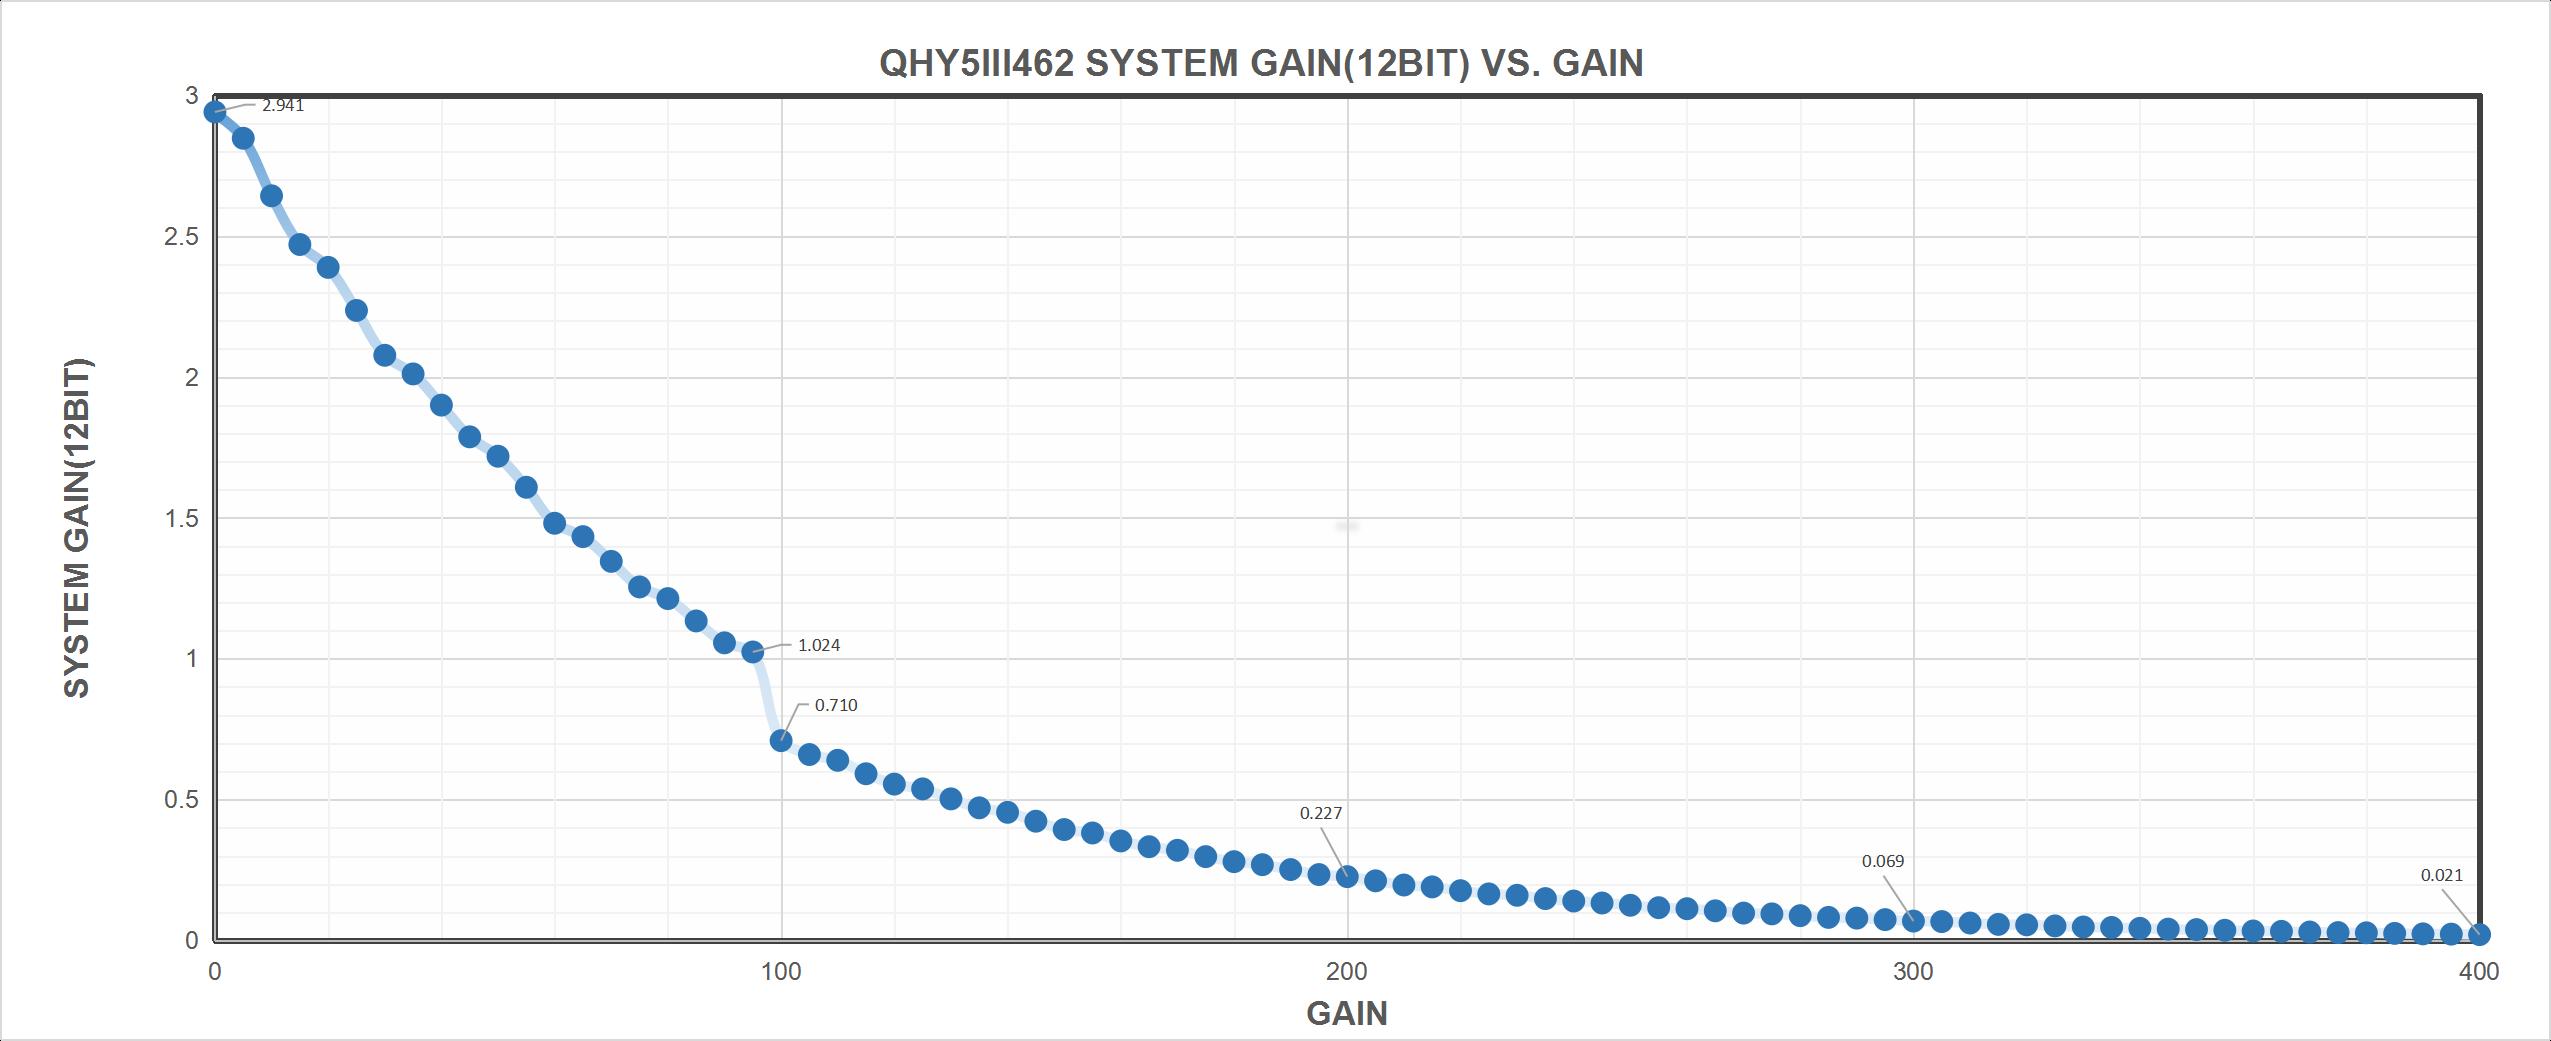 QHY 5-III-462C System Gain (12bit) vs. Gain